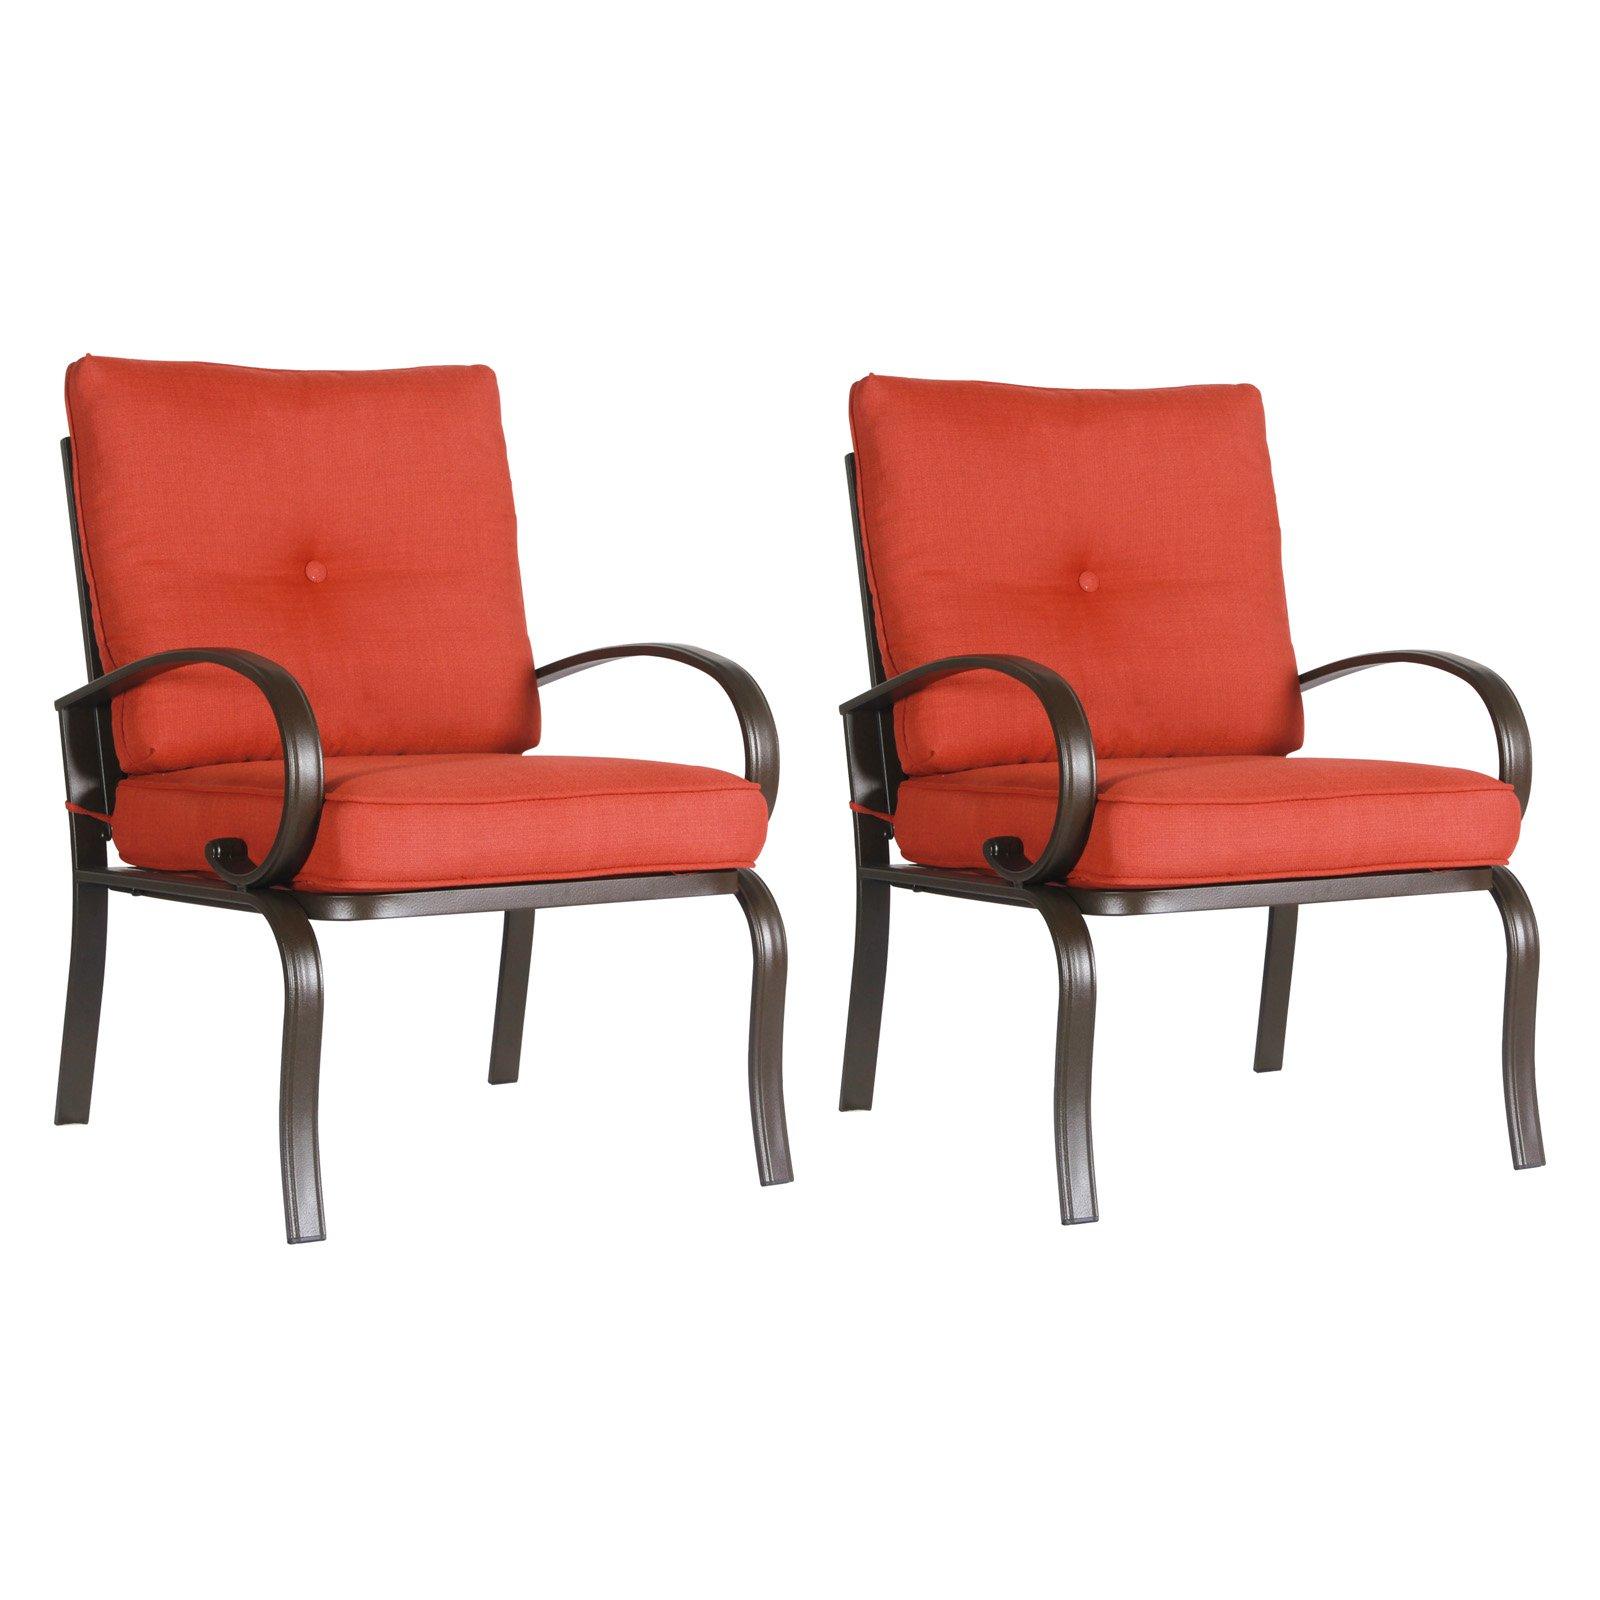 rot iron furniture. Cloud Mountain Wrought Iron Patio Club Dining Chair - Set Of 2 Rot Iron Furniture